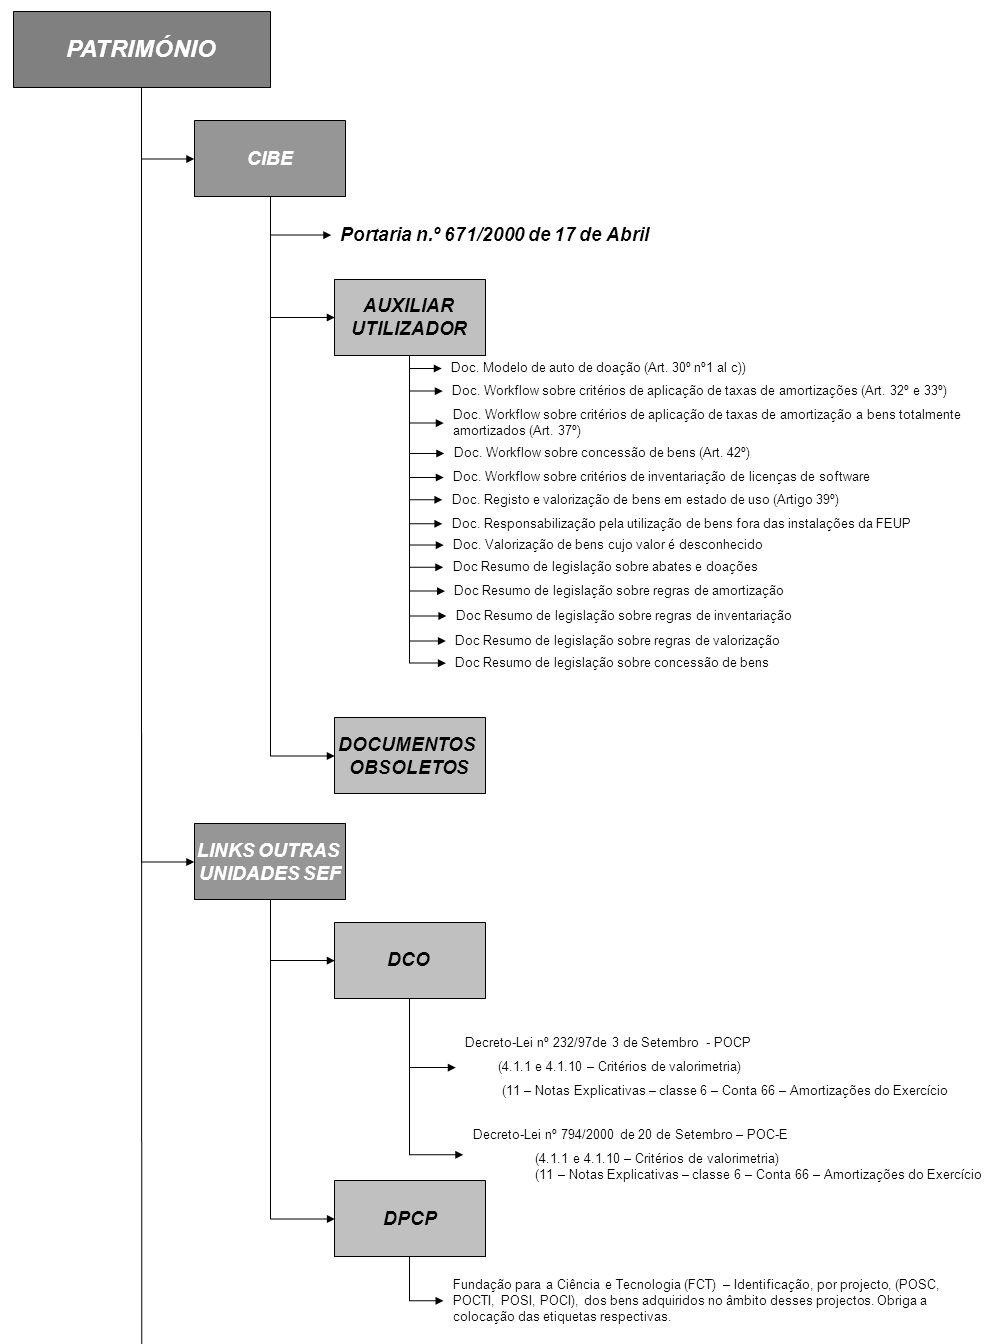 PATRIMÓNIO CIBE Portaria n.º 671/2000 de 17 de Abril AUXILIAR UTILIZADOR Doc. Modelo de auto de doação (Art. 30º nº1 al c)) Doc. Workflow sobre critér